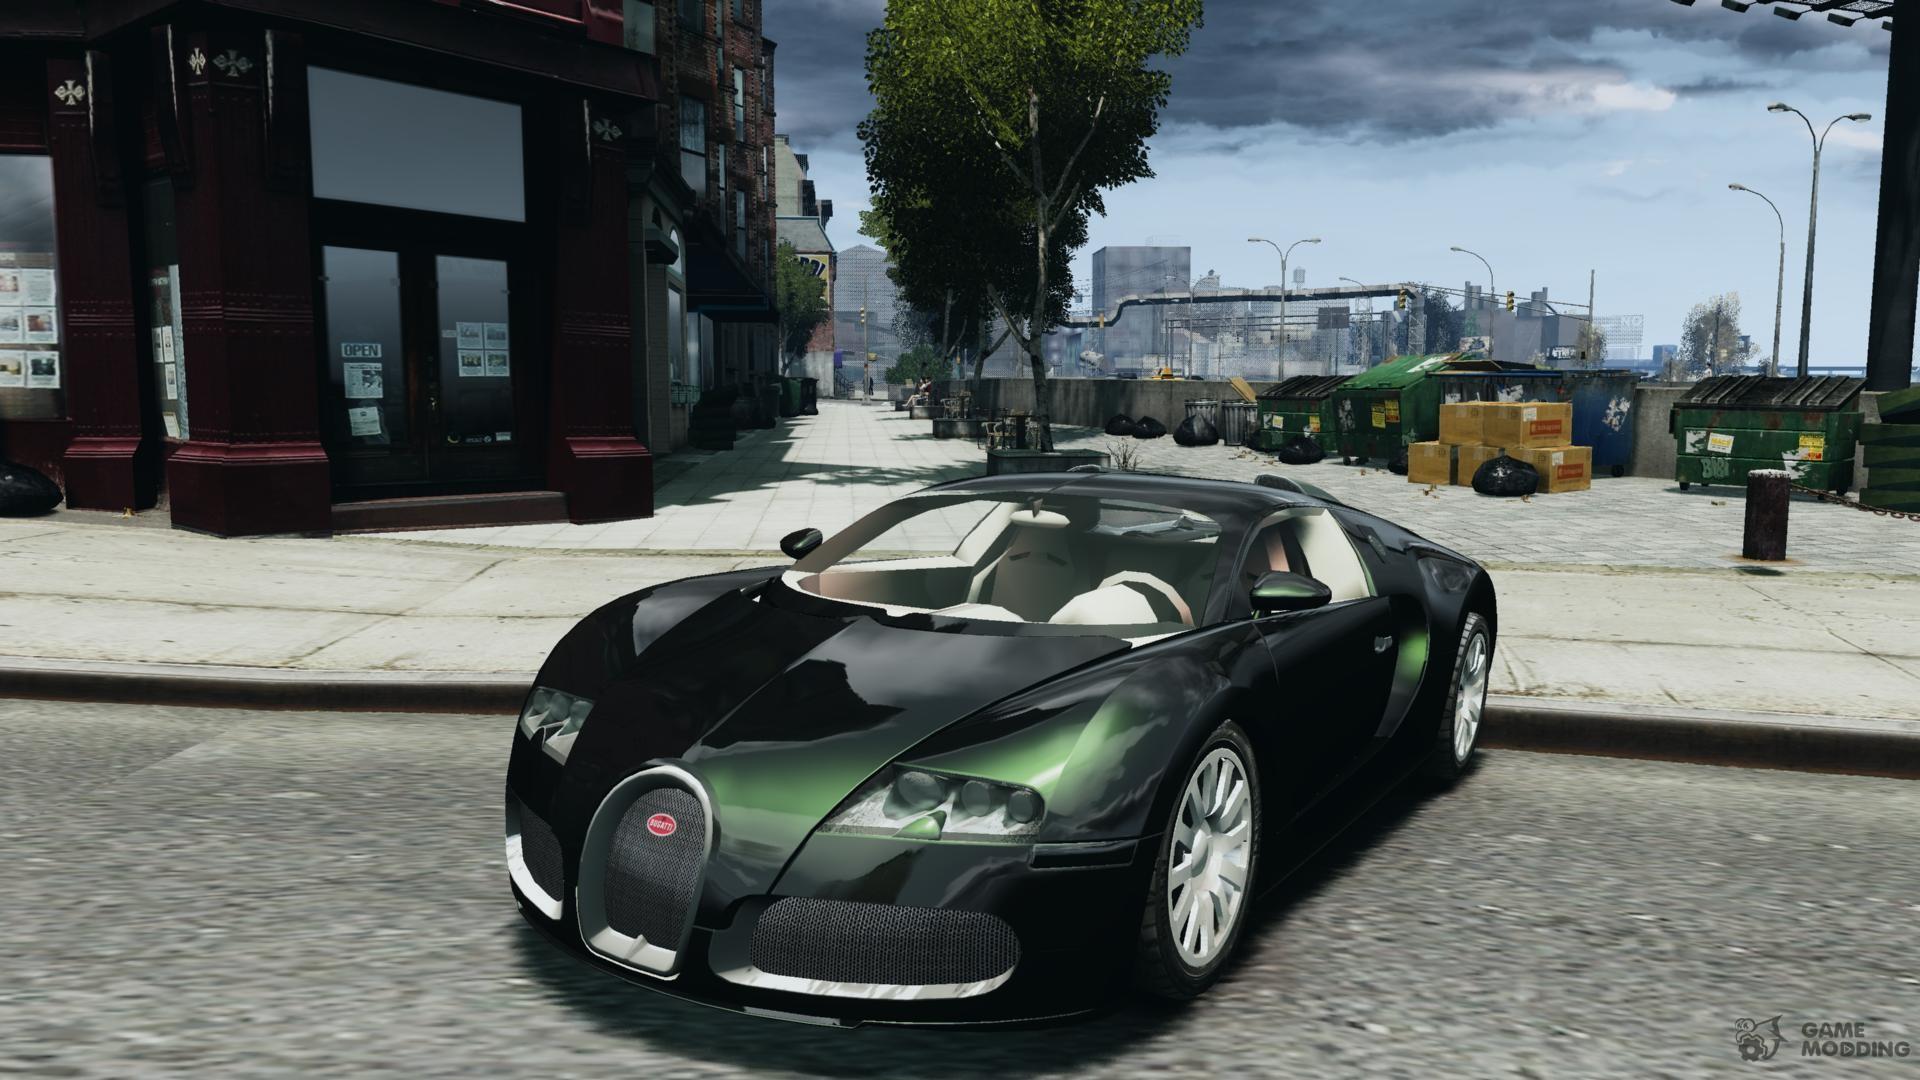 2ad000d86f6c629d60dc6f0cd8a847cad227c8ec1a7419c39fffcc5eae451914 Wonderful Bugatti Veyron Xbox 360 Games Cars Trend